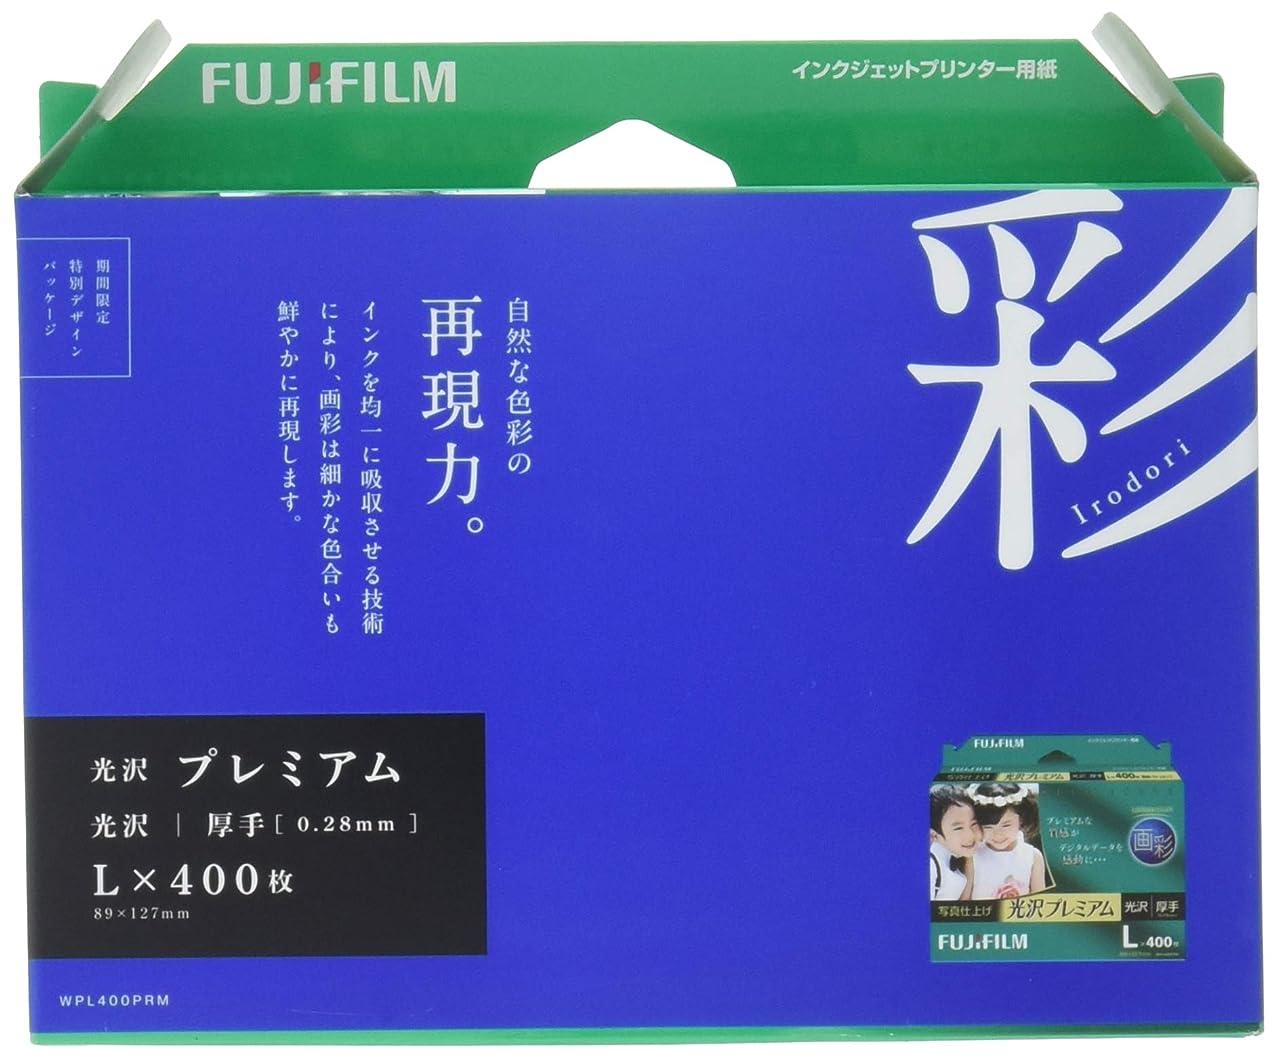 誕生始める他の場所FUJIFILM 写真用紙 画彩 光沢 厚手 L 400枚 WPL400PRM